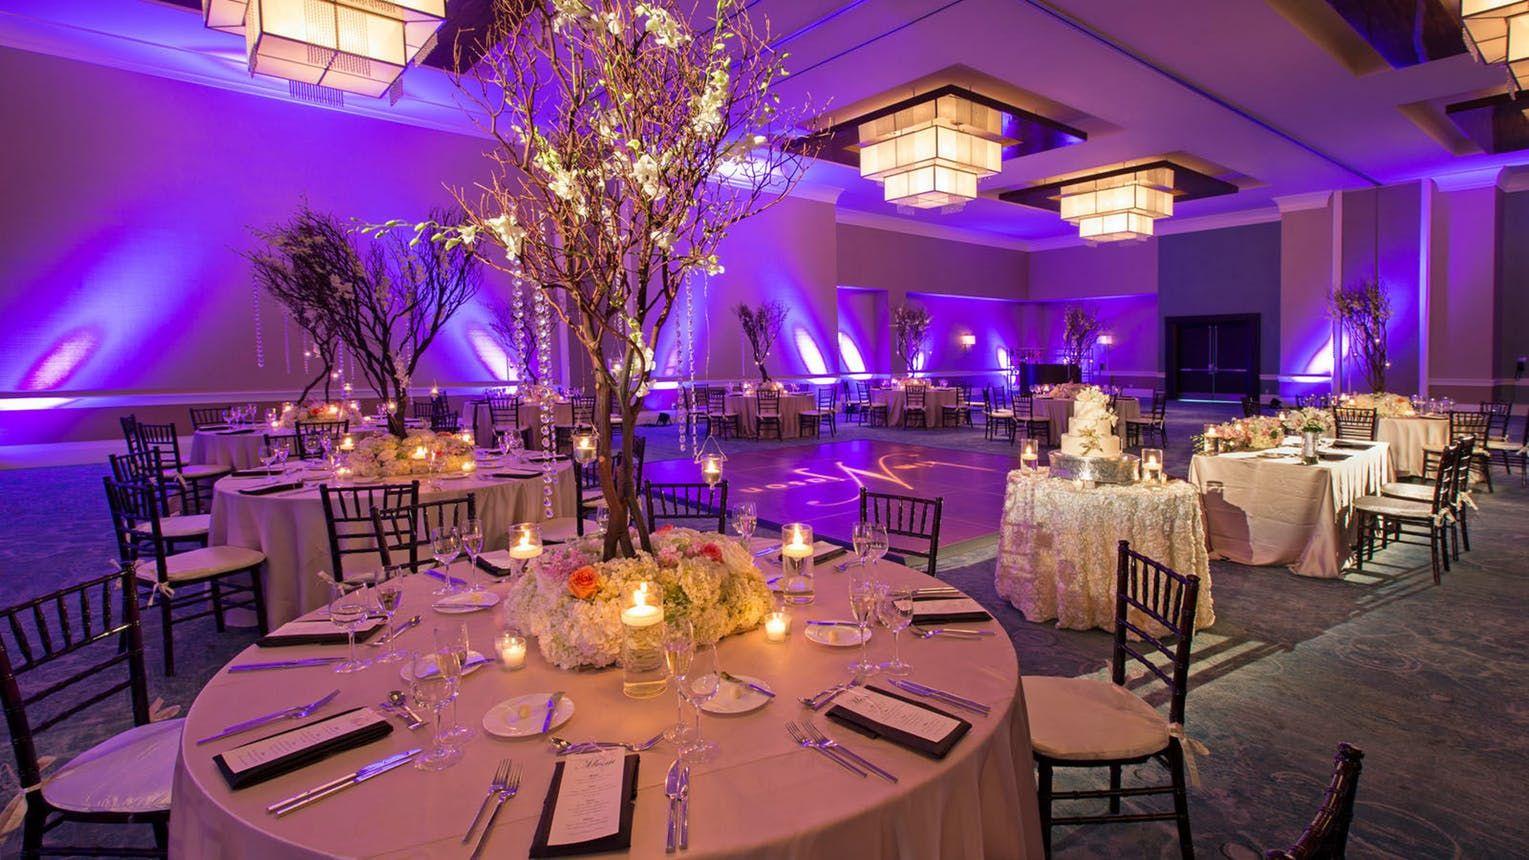 Westin Fort Lauderdale Beach Resort Ft Lauderdale And Other Beautiful Ft La In 2020 Fort Lauderdale Beach Resort Florida Destination Wedding Venues Lauderdale Beach